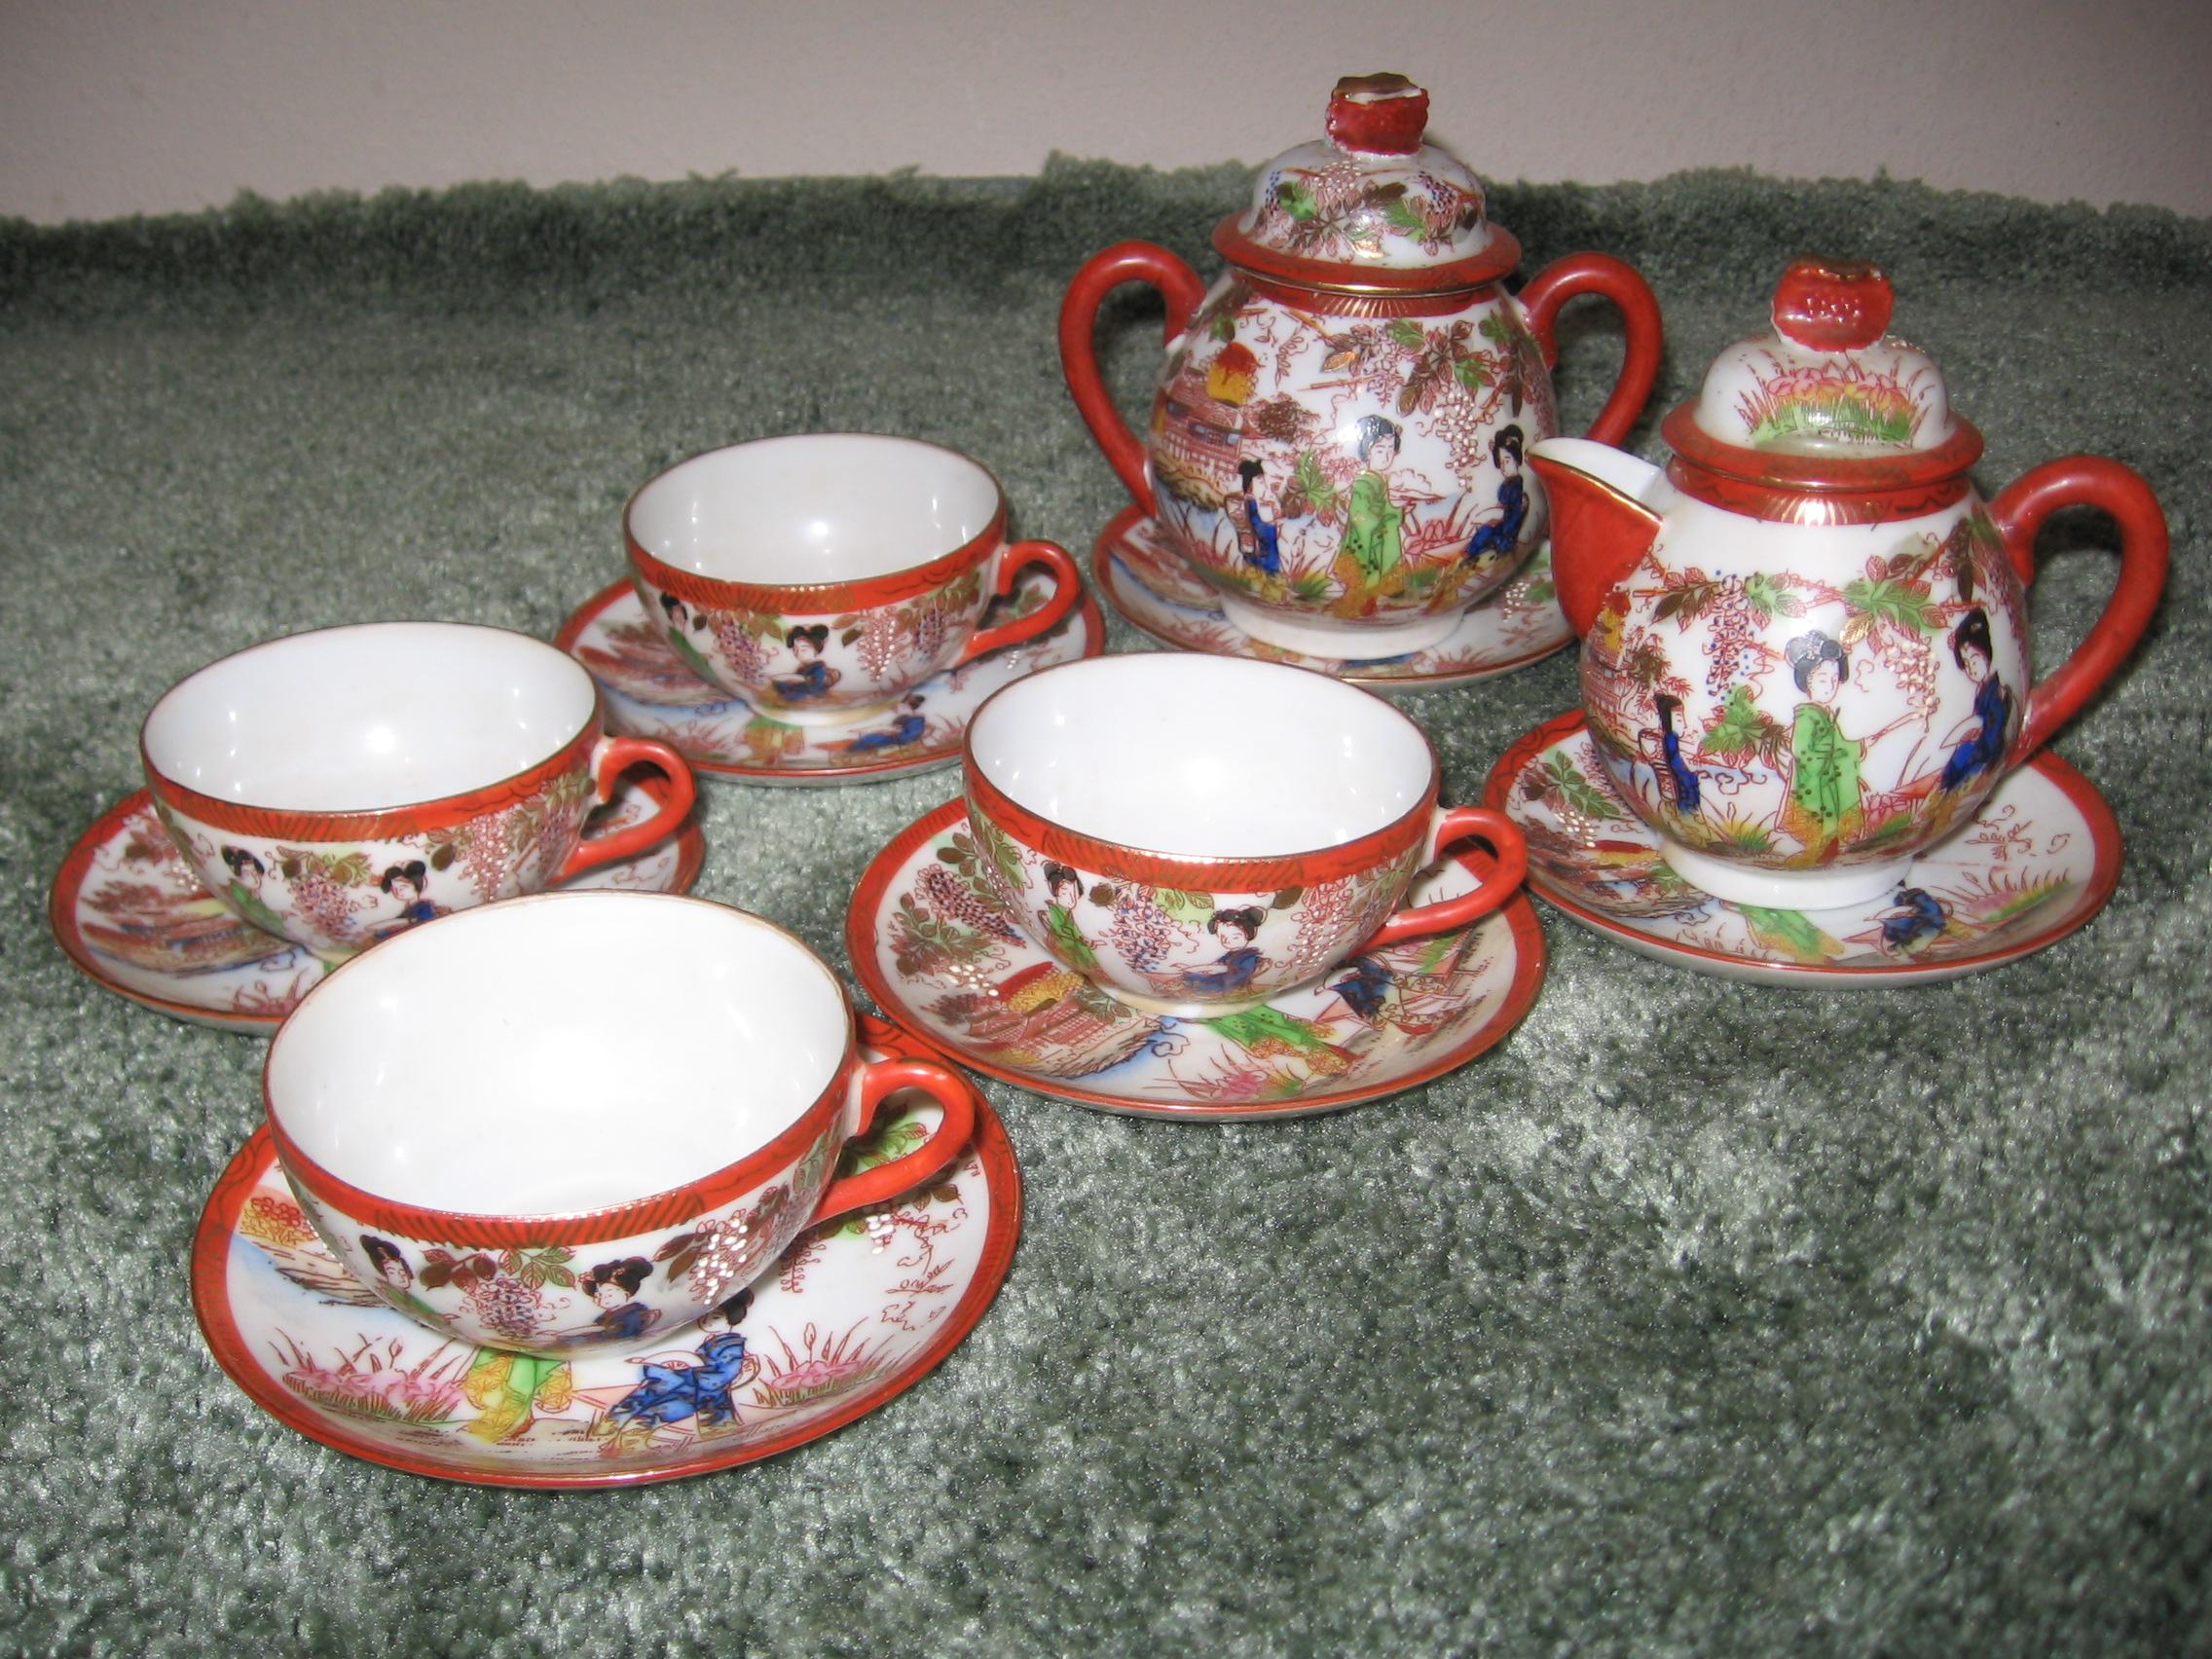 1900-30s Giesha Girls Tea Set